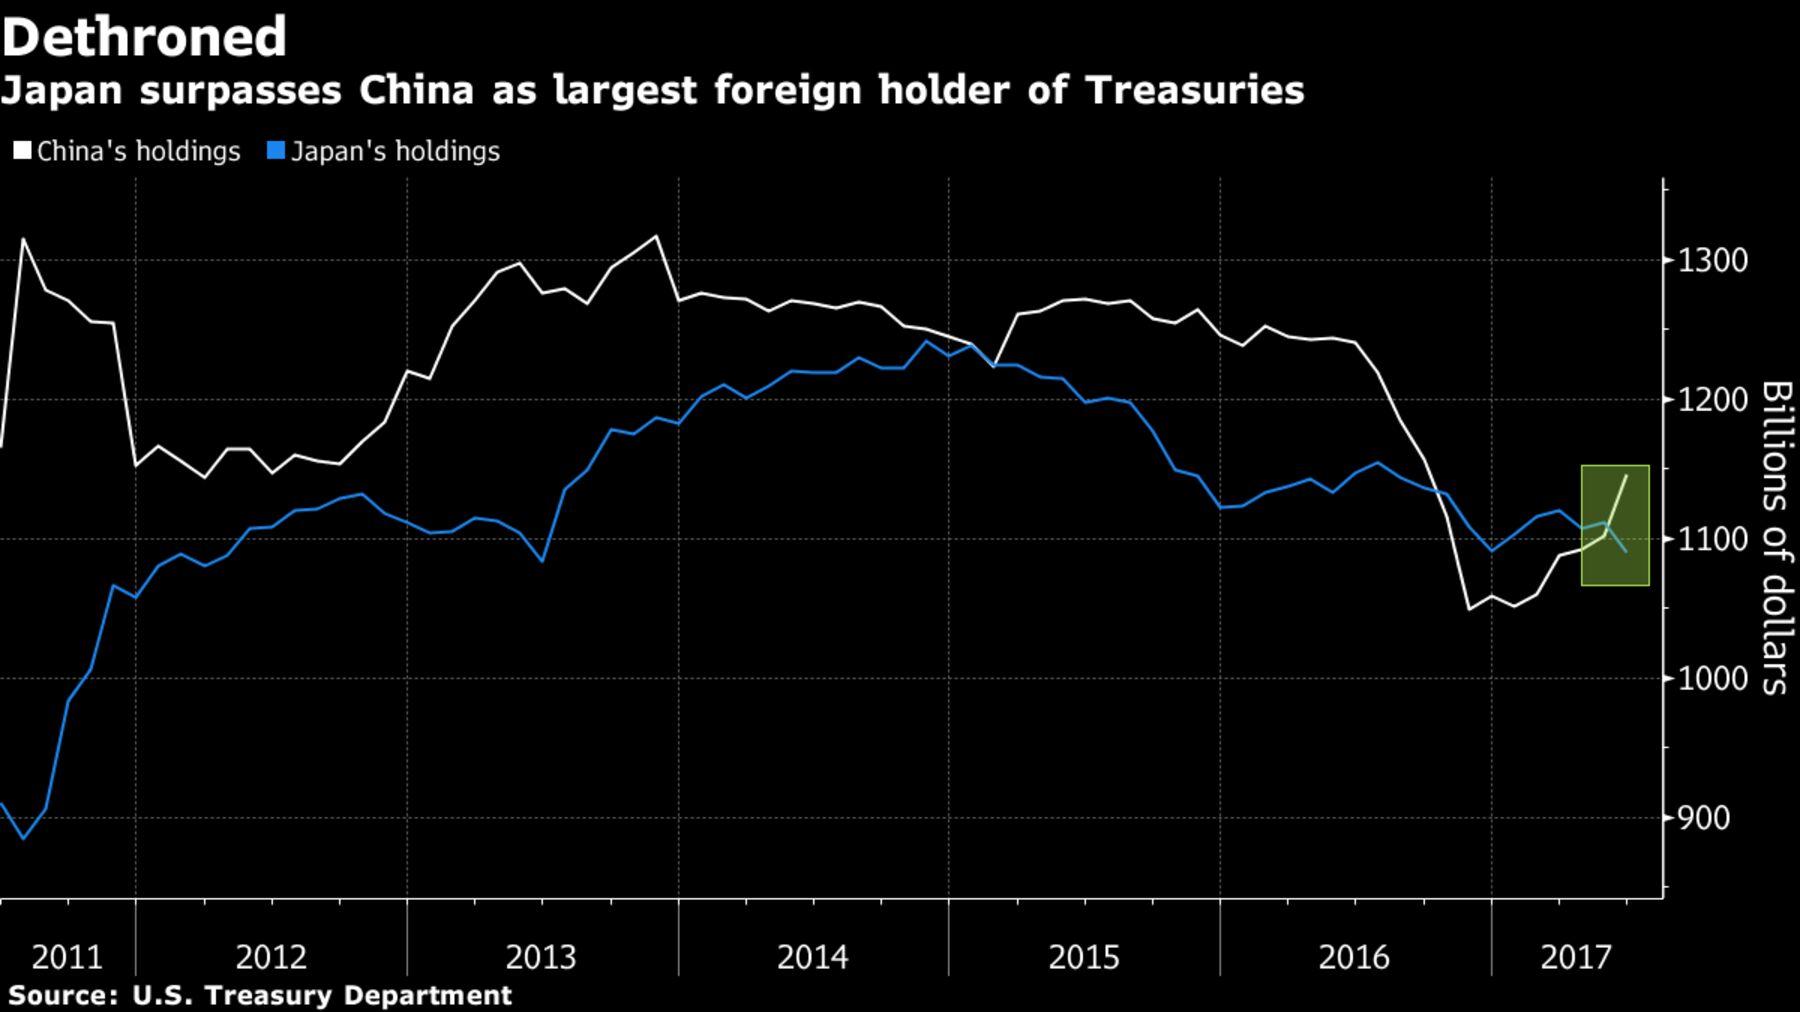 【米国債】日本の米国債保有残高、中国を抜き外国勢首位に浮上